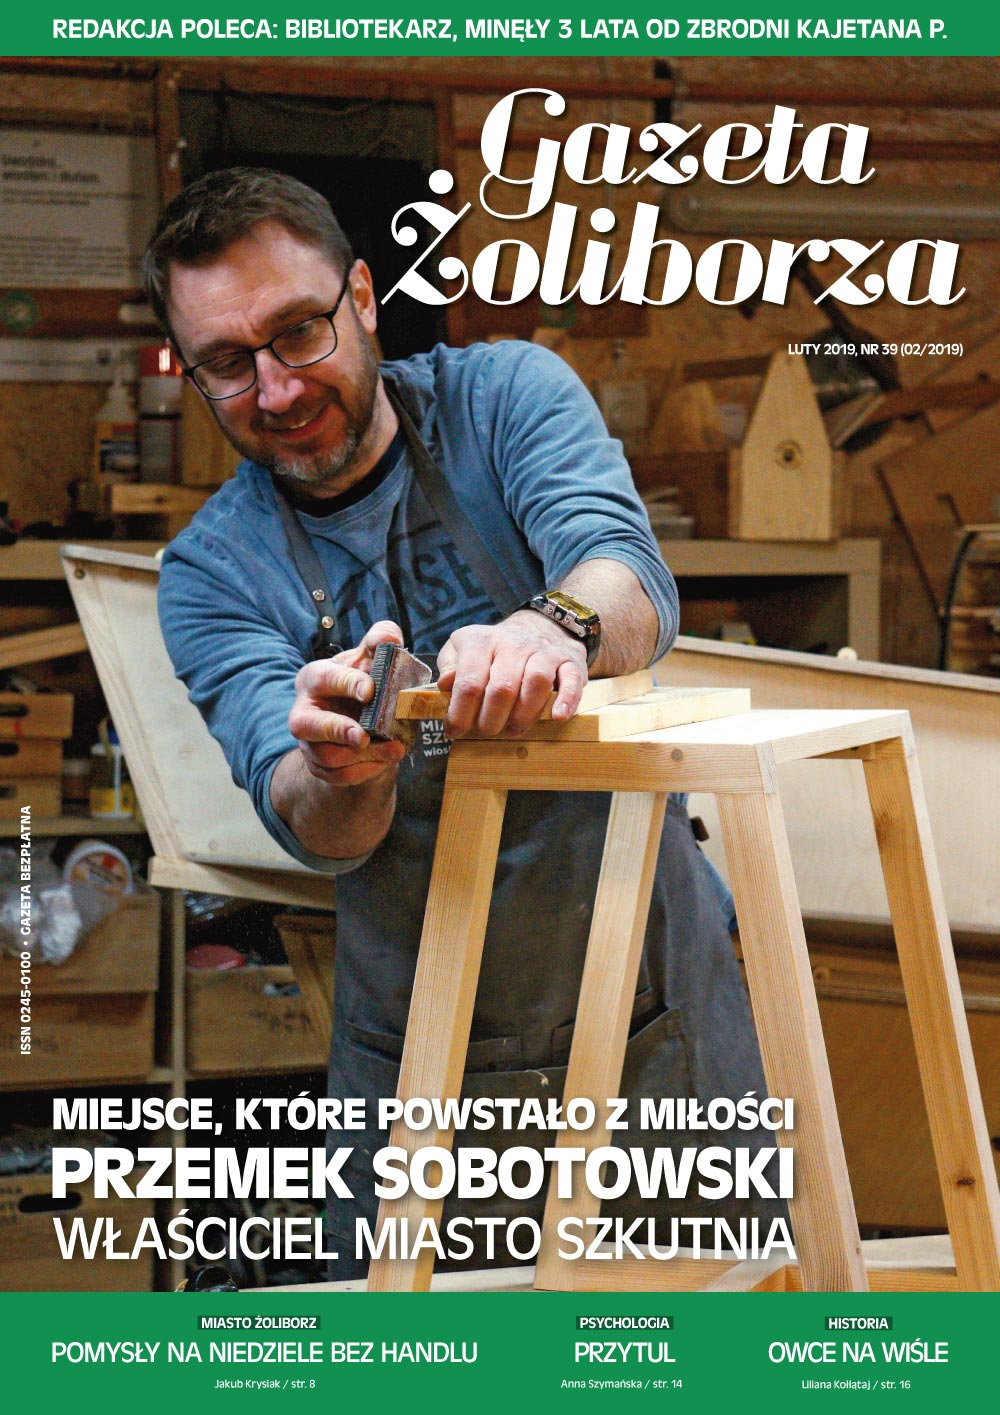 Gazeta Żoliborza - 02/2019 (38)